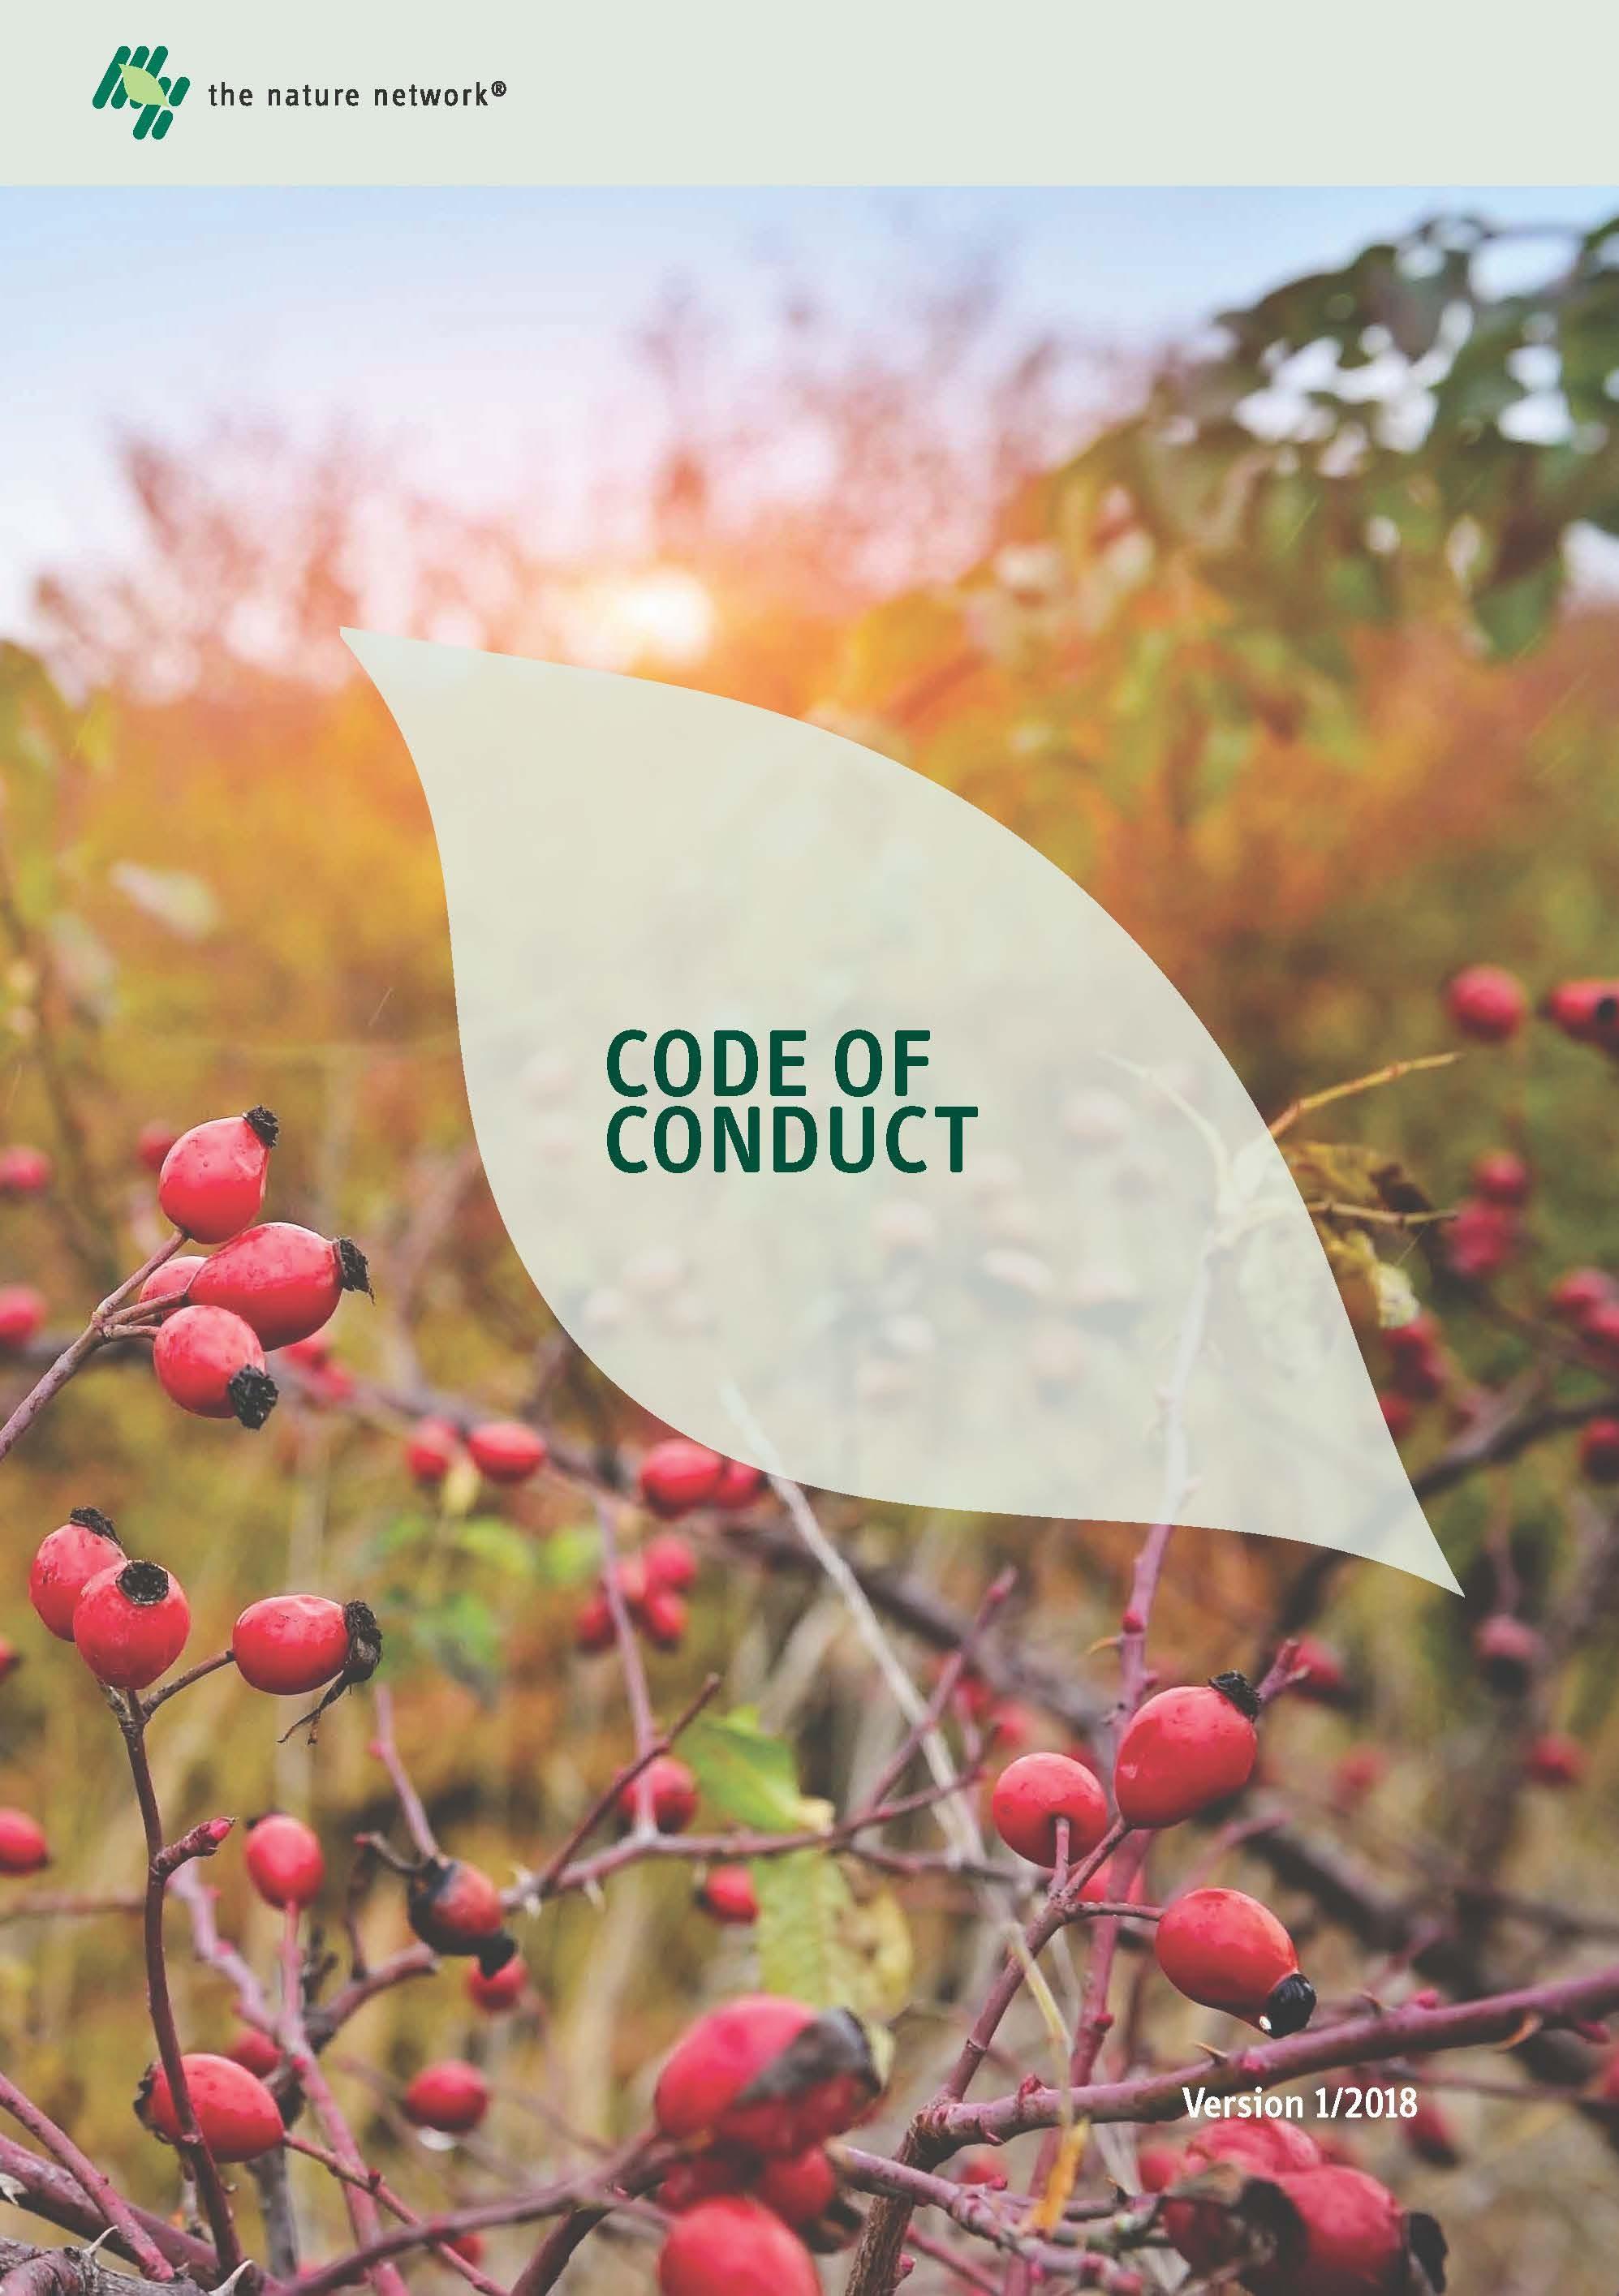 nachhaltigkeit_code-of-conduct_-e1544185045626